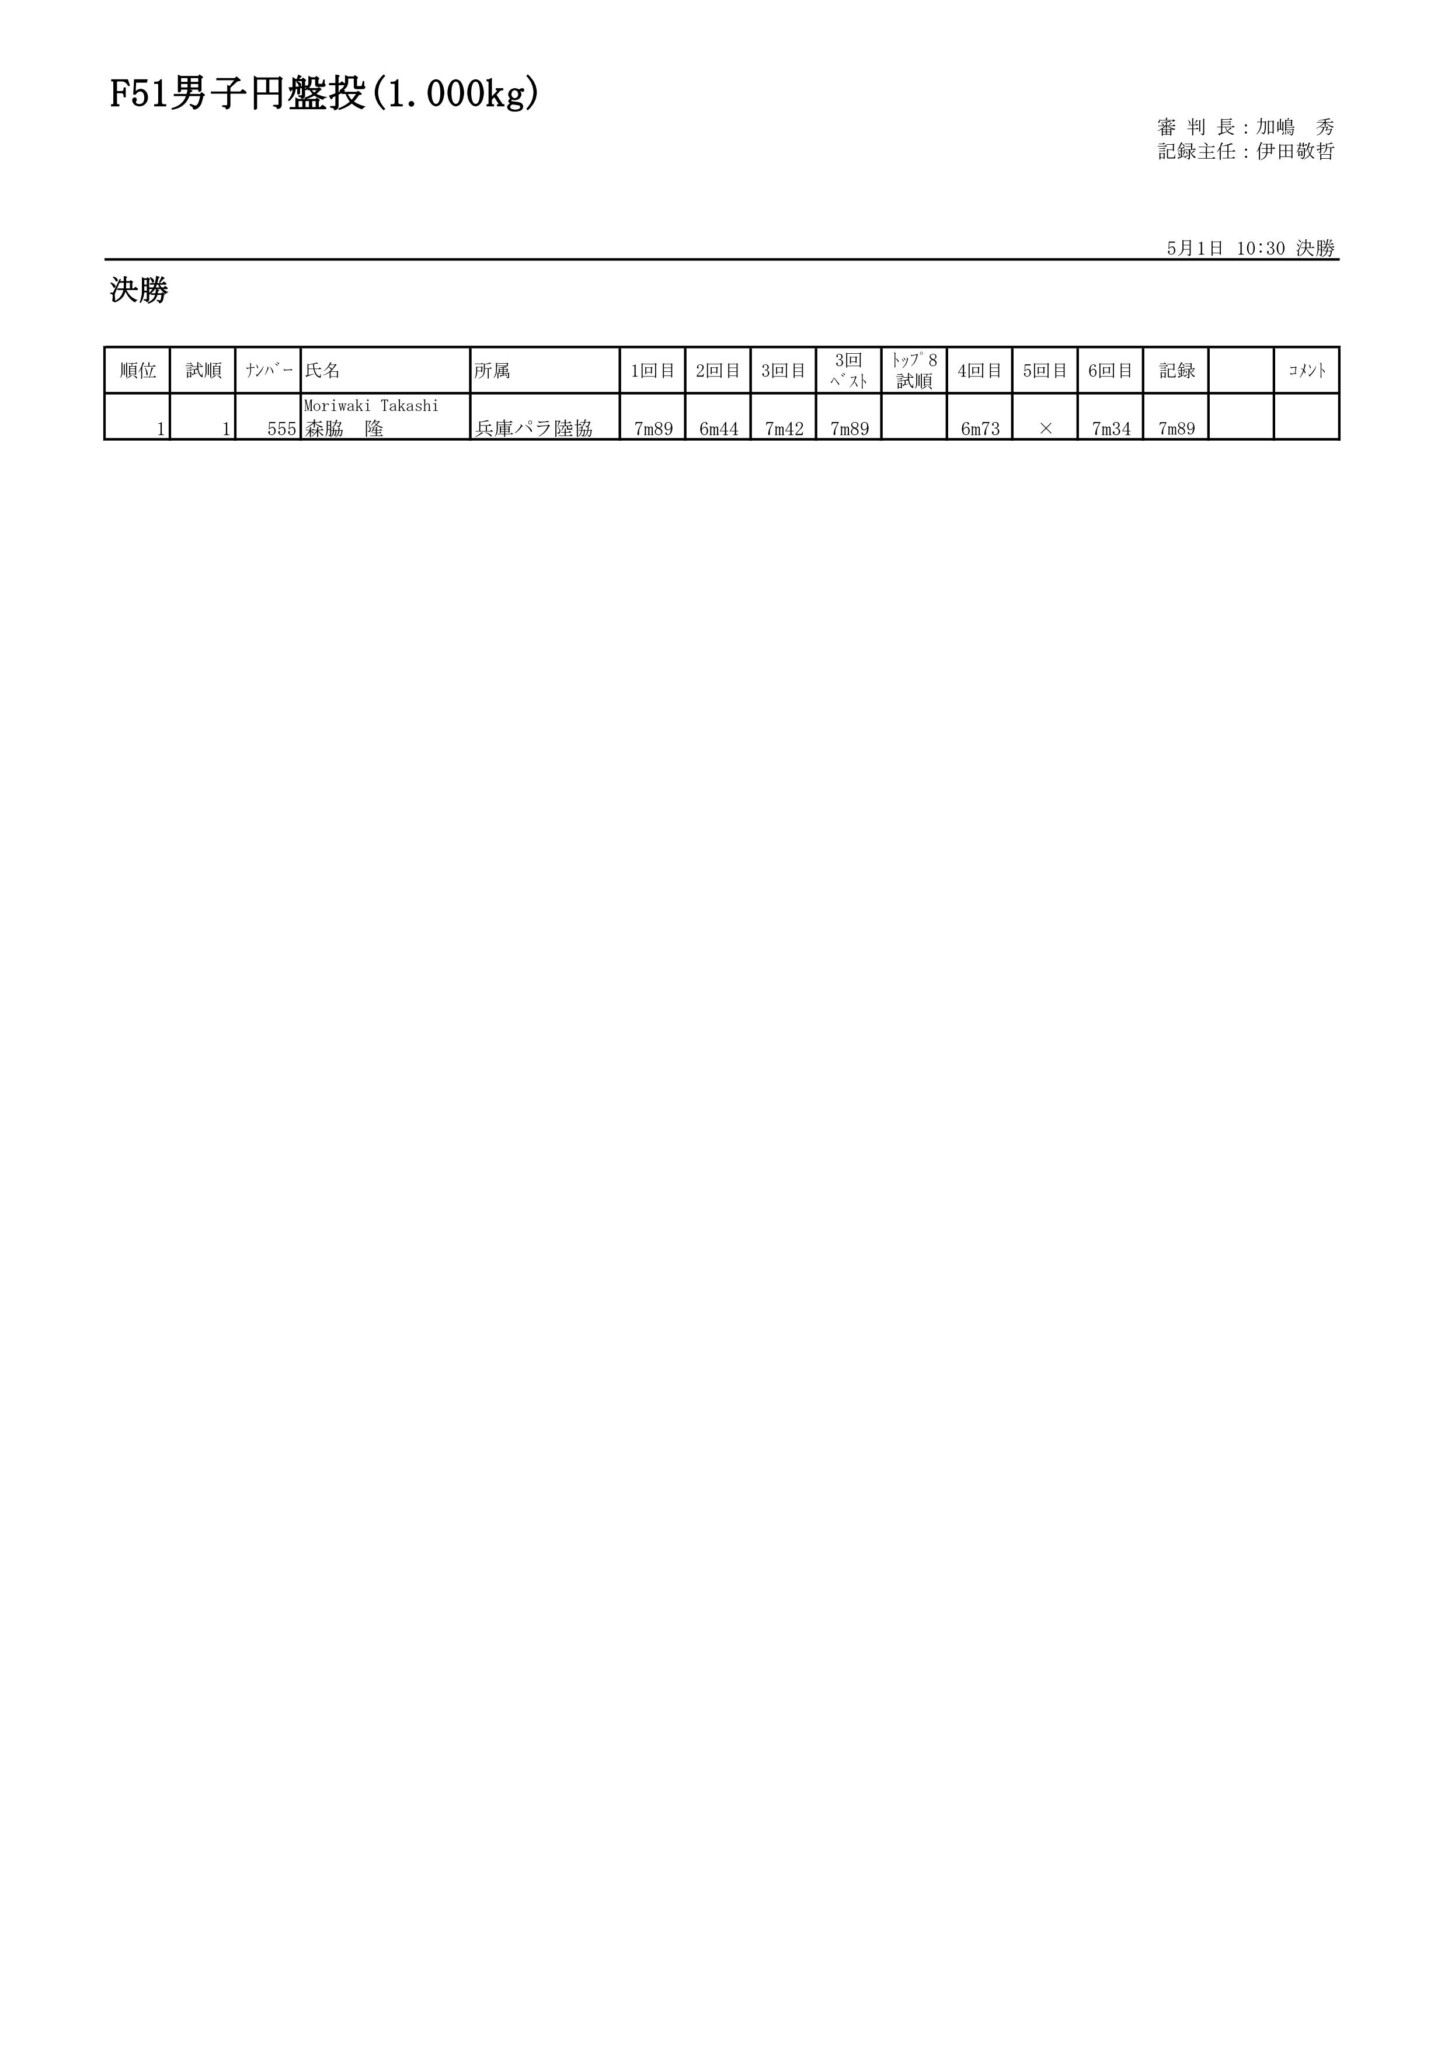 21F51男子円盤投(1.000kg)_01